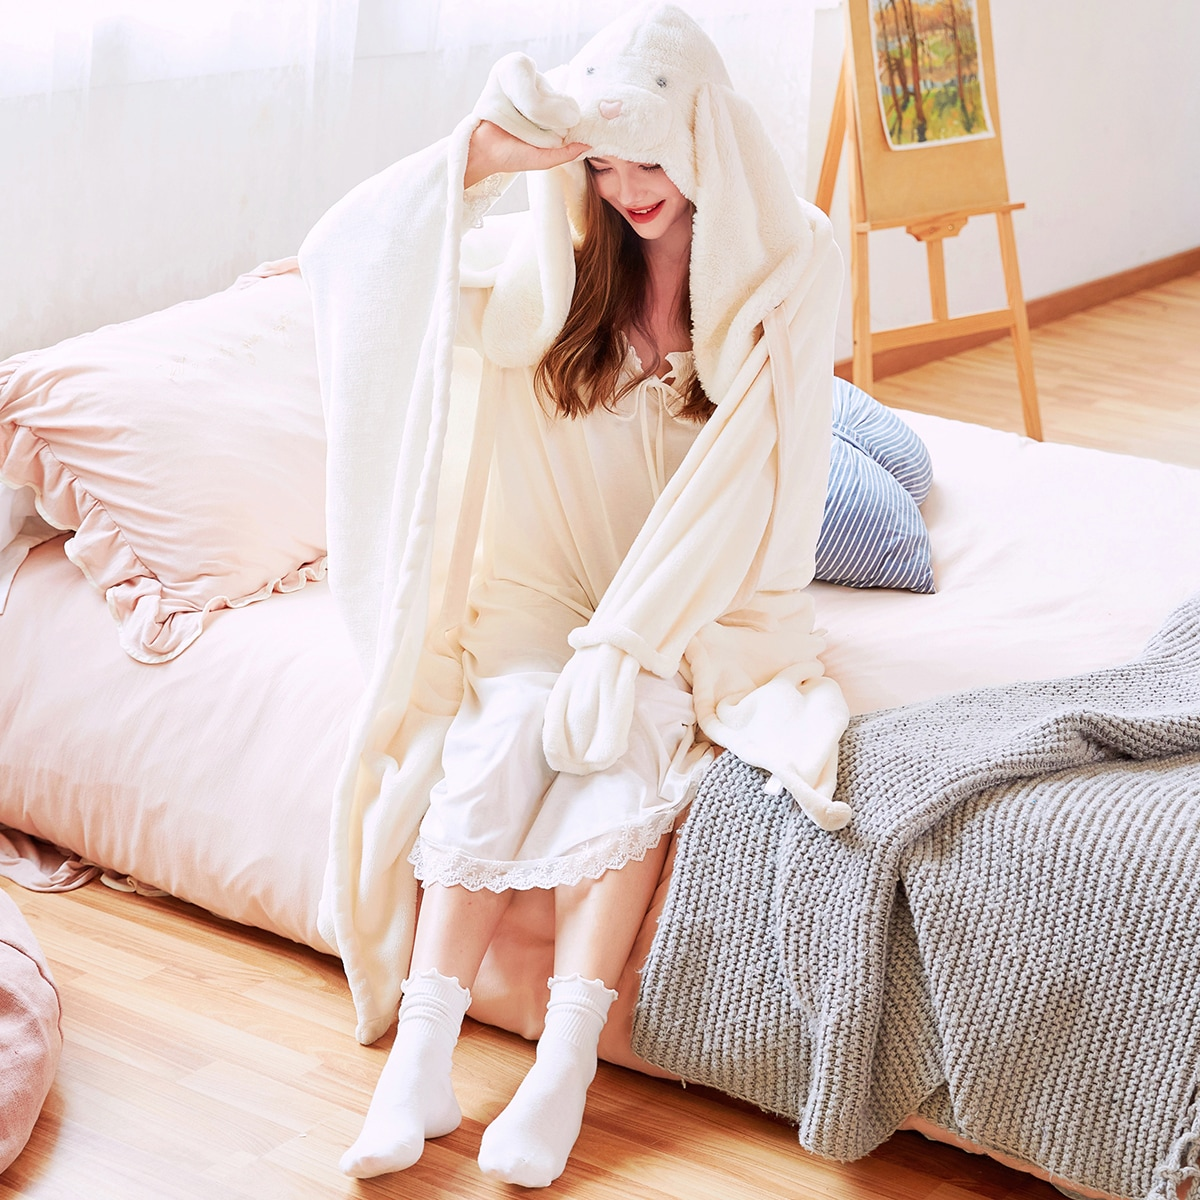 Фланелевый халат с капюшоном